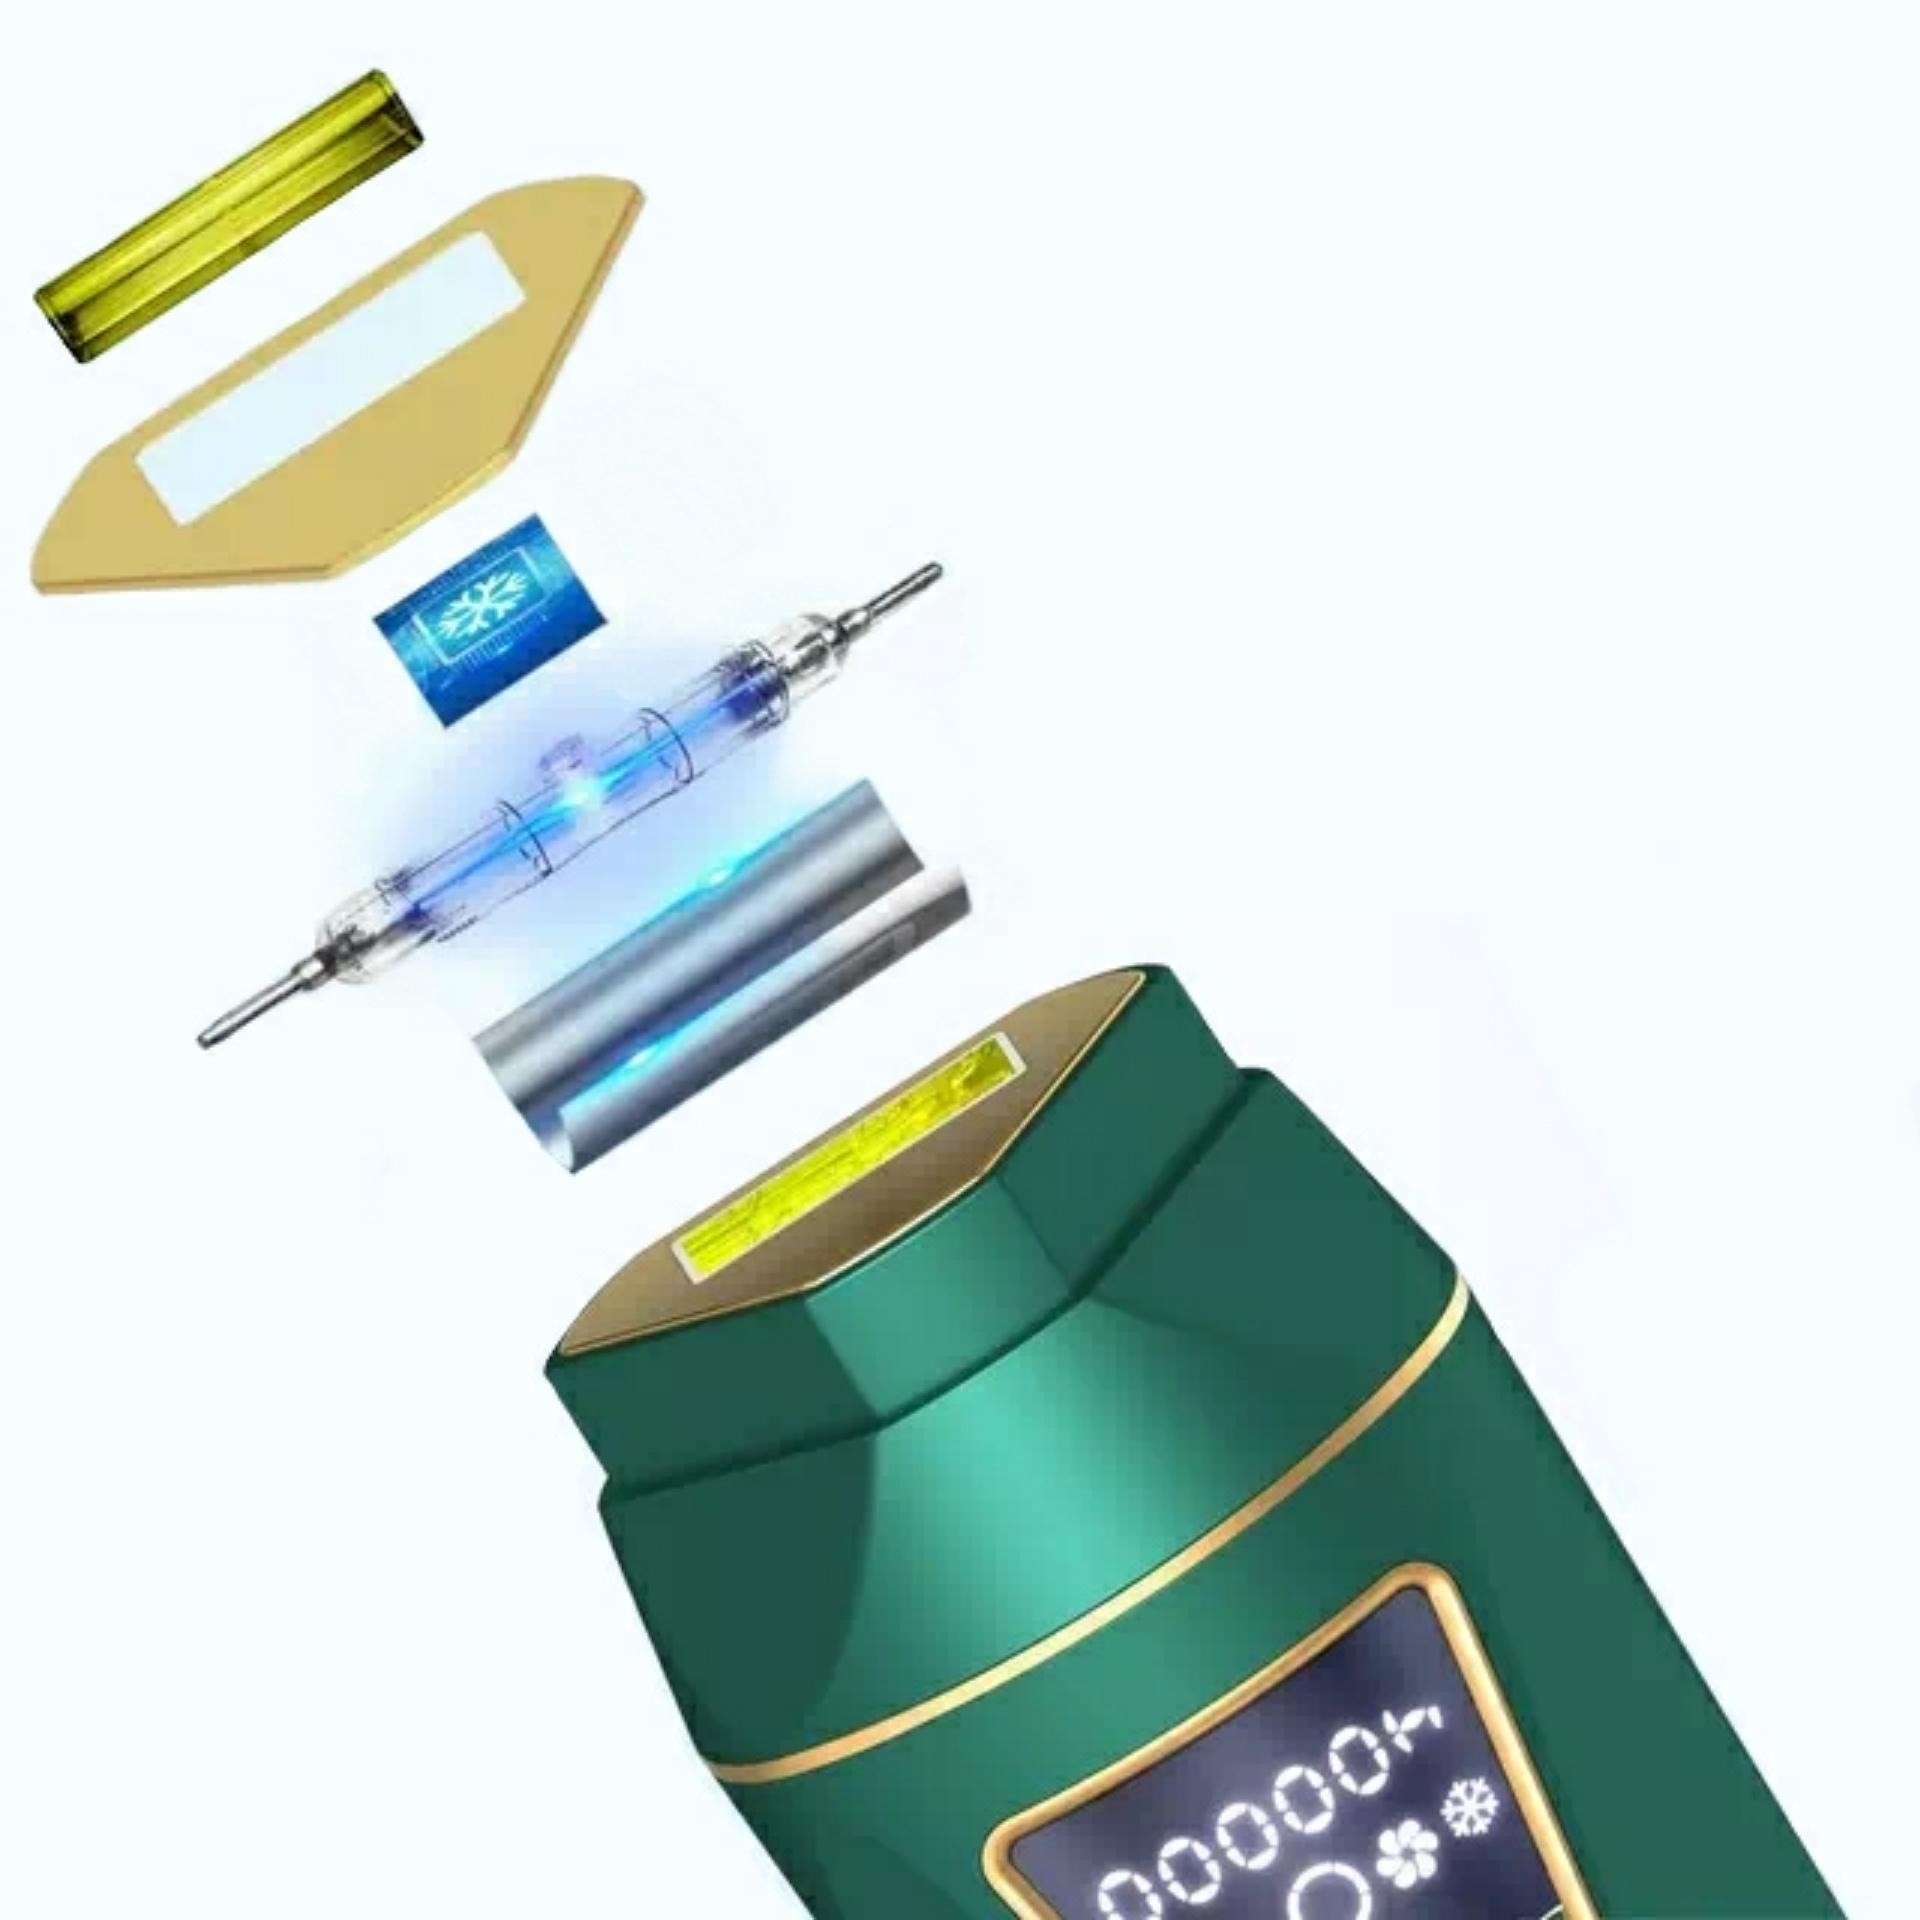 لیزر بدن لسکلتون مدل T015C